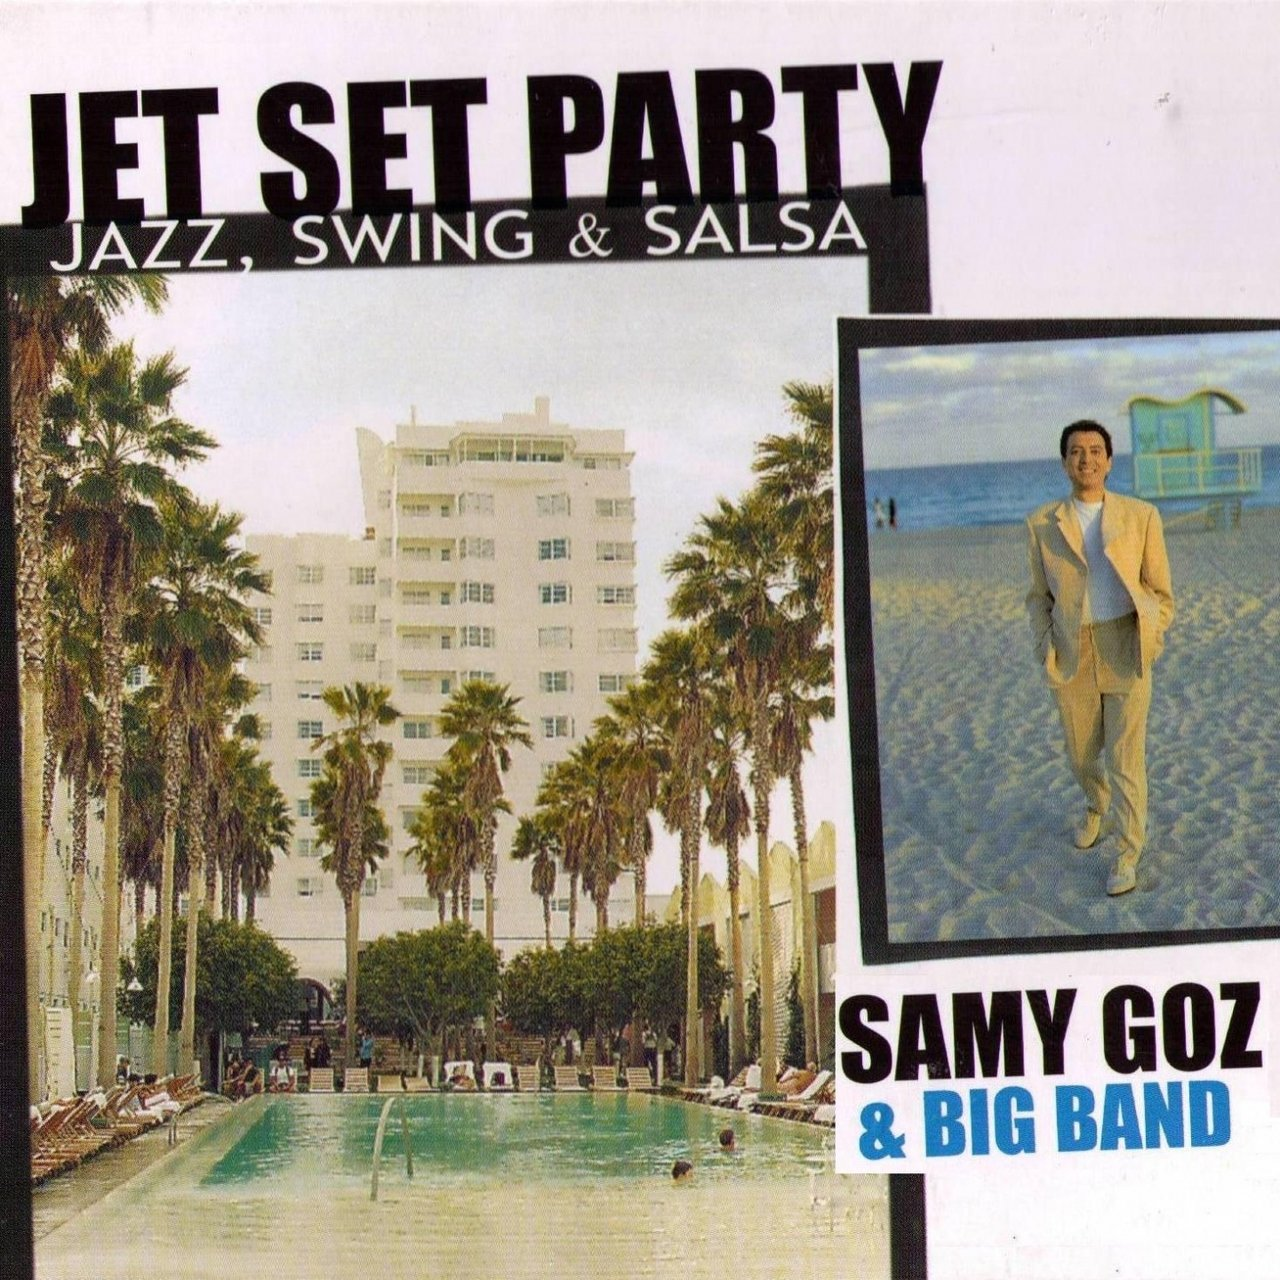 TIDAL: Listen to Jet Set Party: Jazz, Swing & Salsa on TIDAL